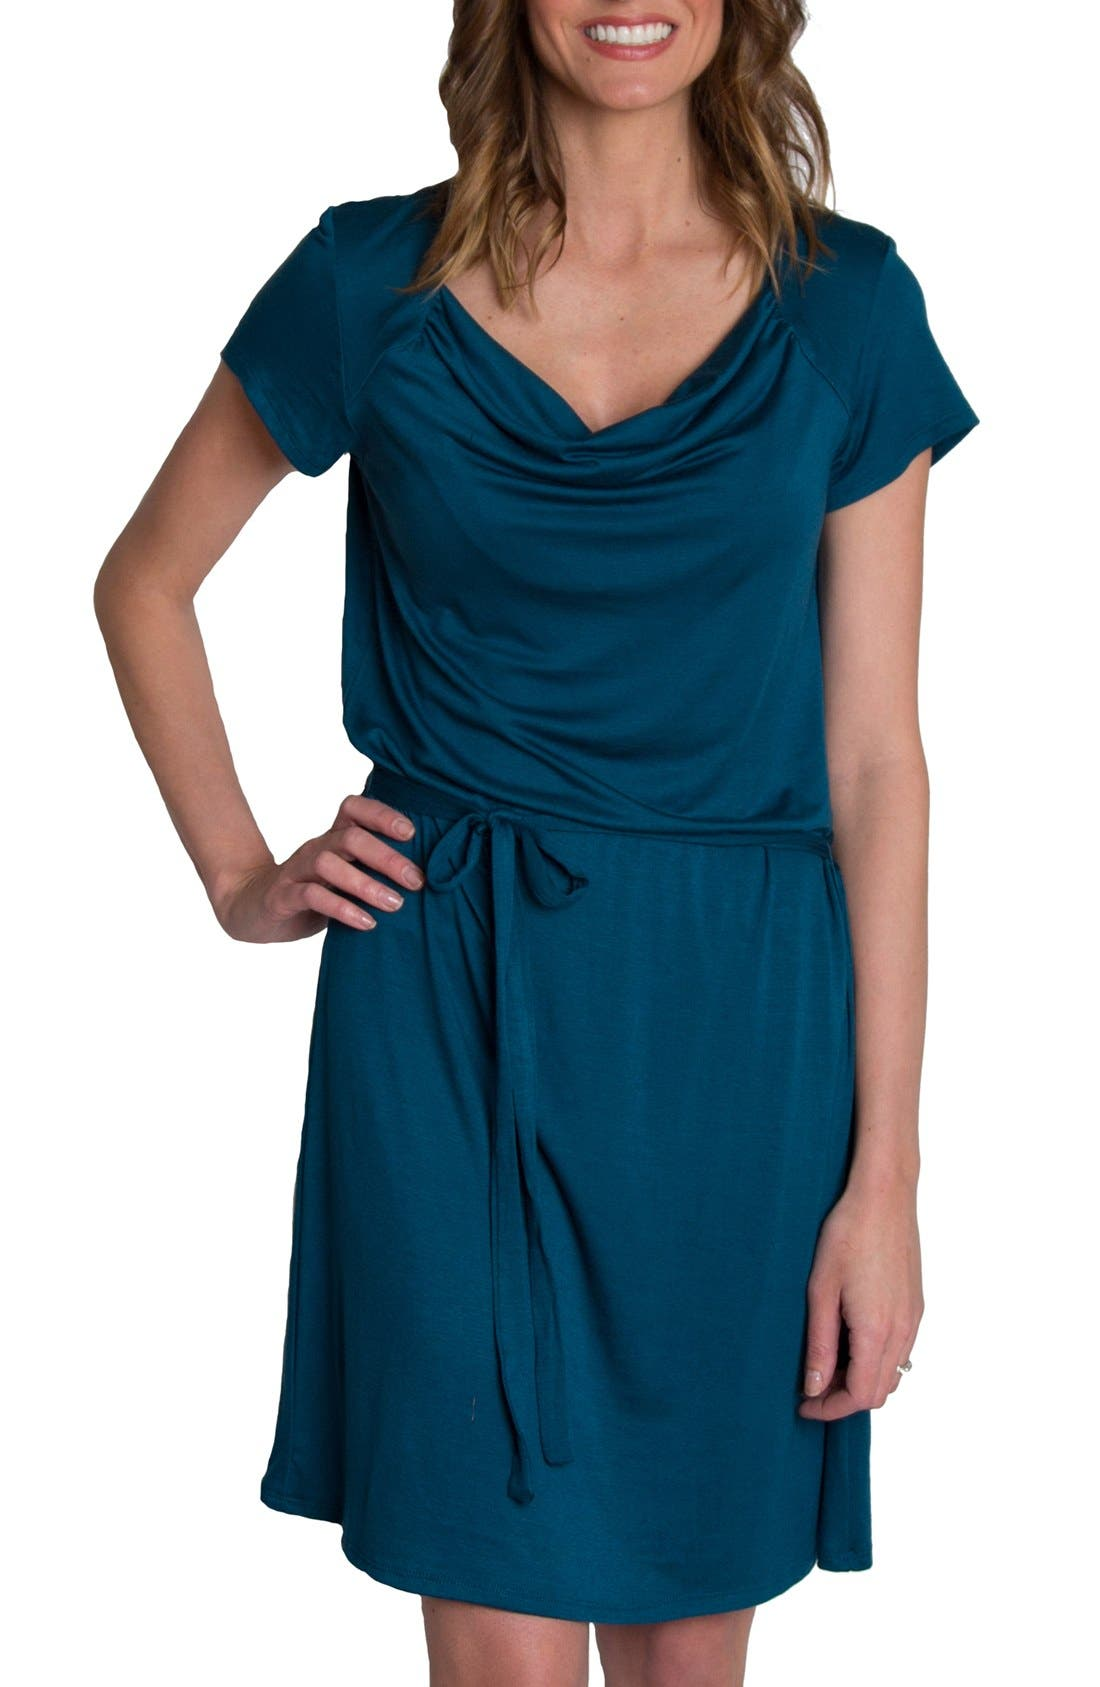 'Chic' Cowl Neck Nursing Dress,                             Main thumbnail 1, color,                             Teal